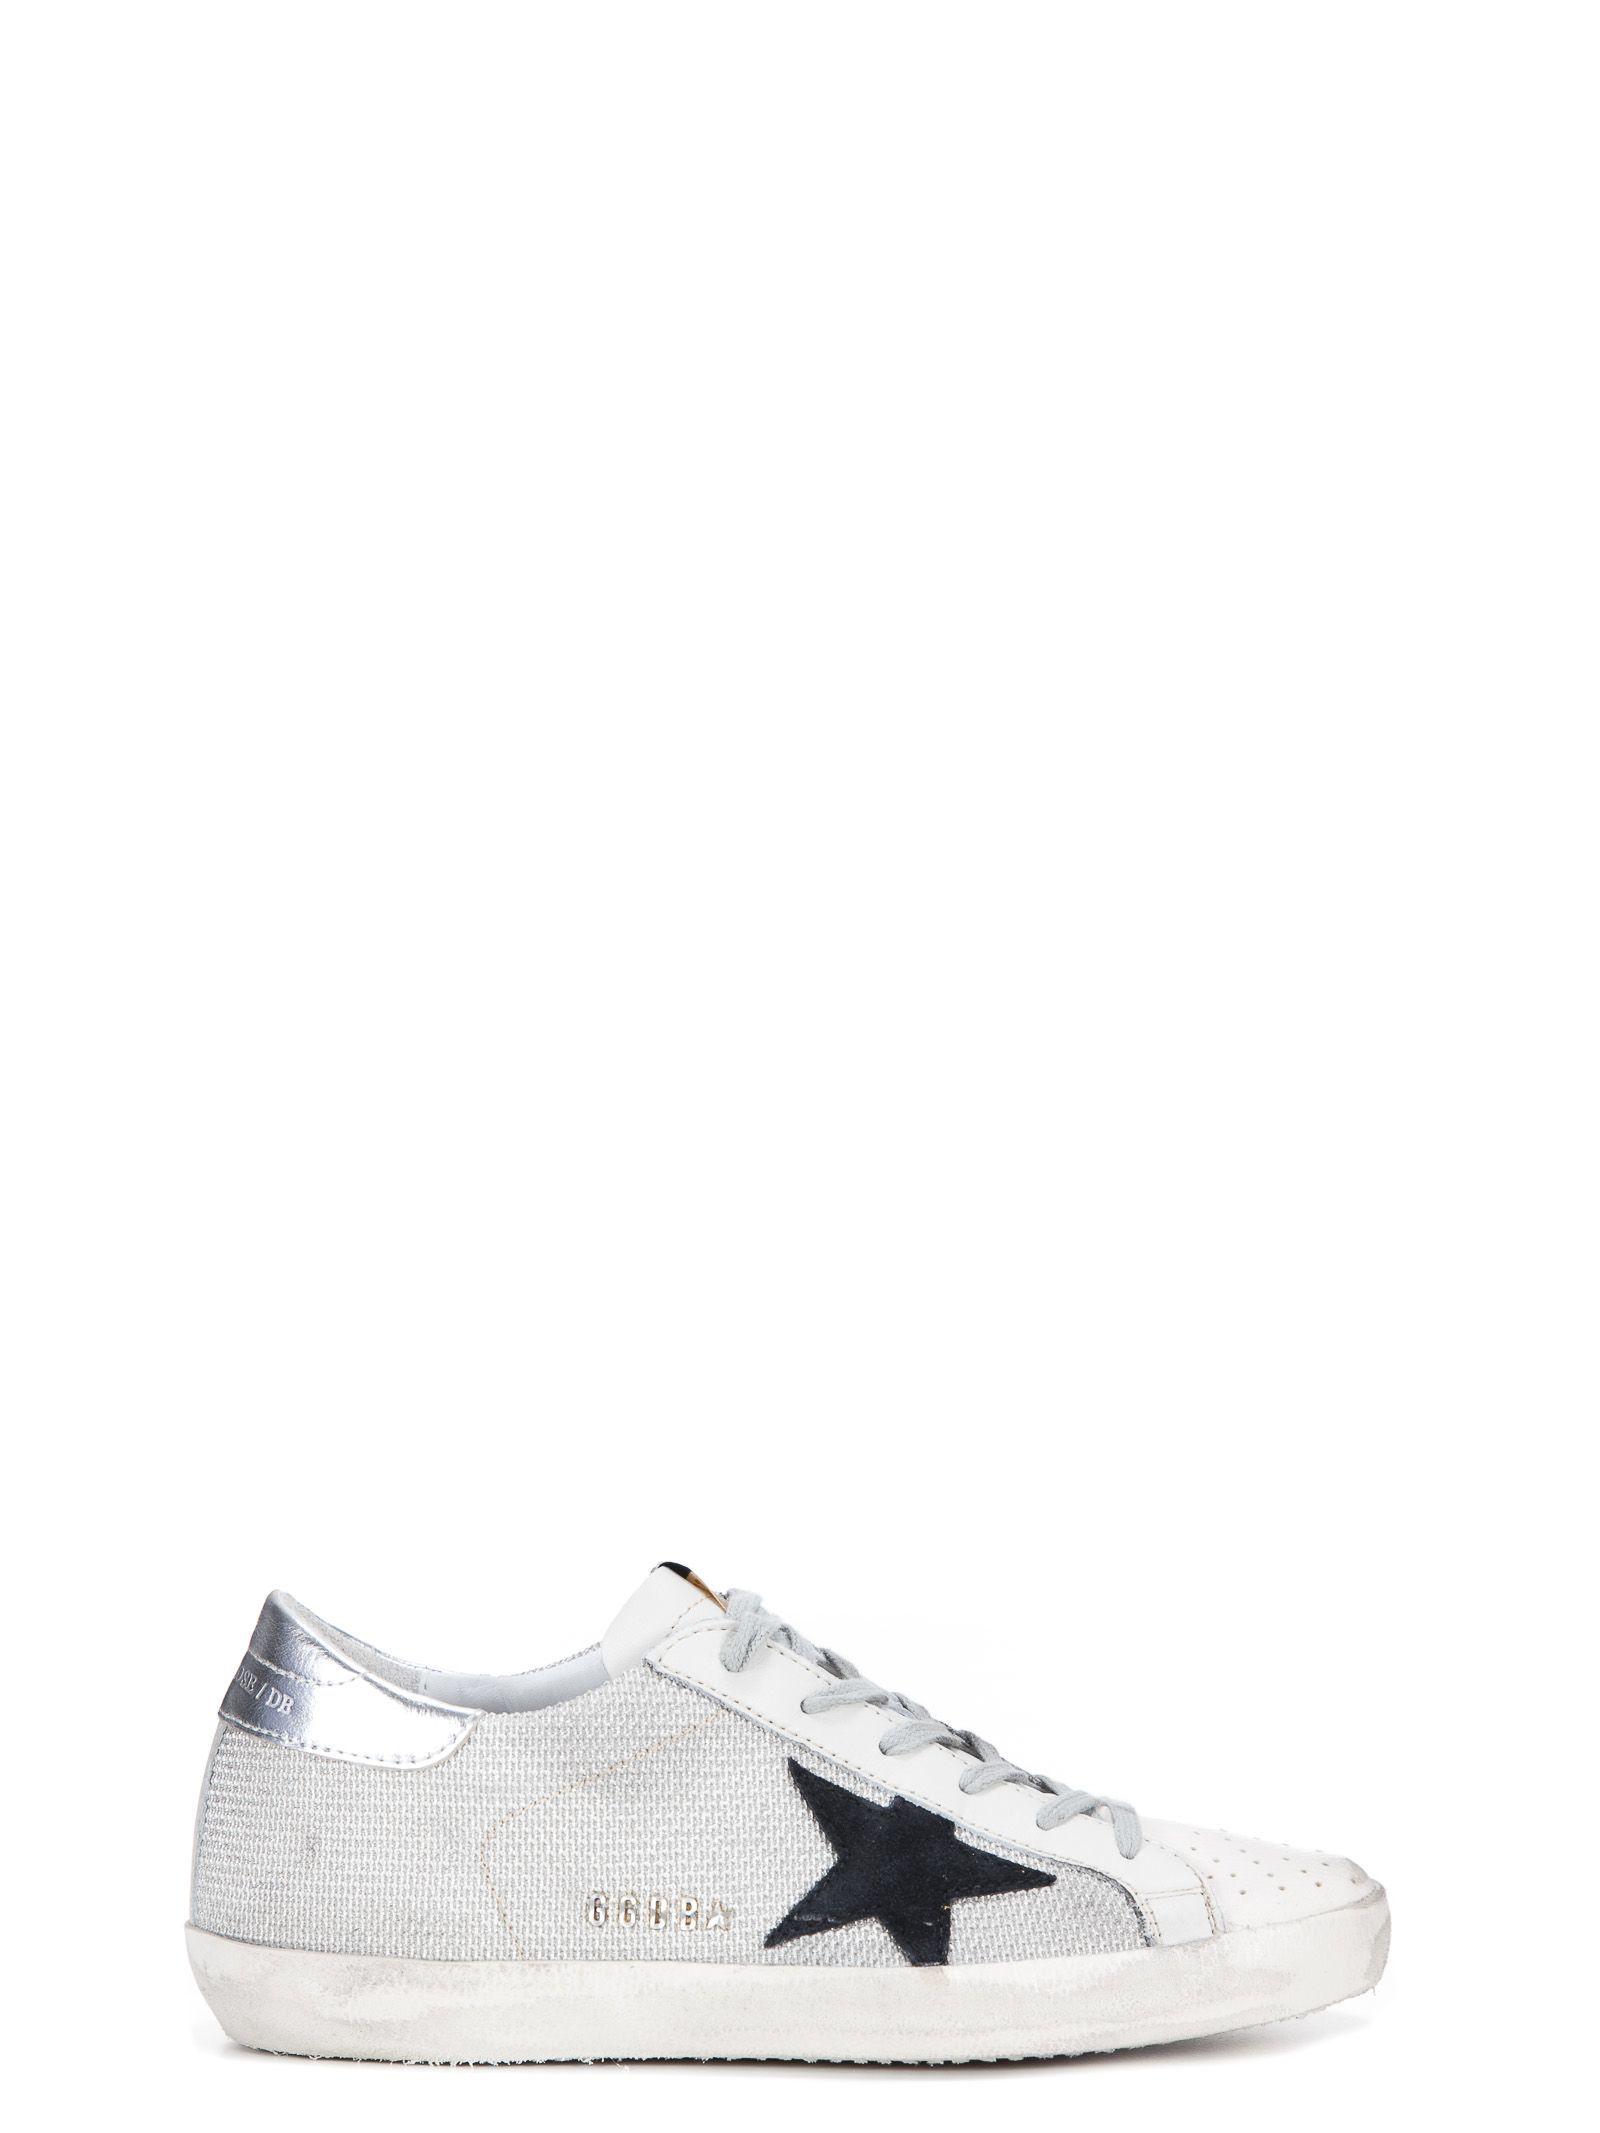 Golden Goose Mens White Blue Pat... outlet footlocker finishline exclusive cheap online cheap sale ebay sneakernews cheap online free shipping 2014 new cXtjRD3T